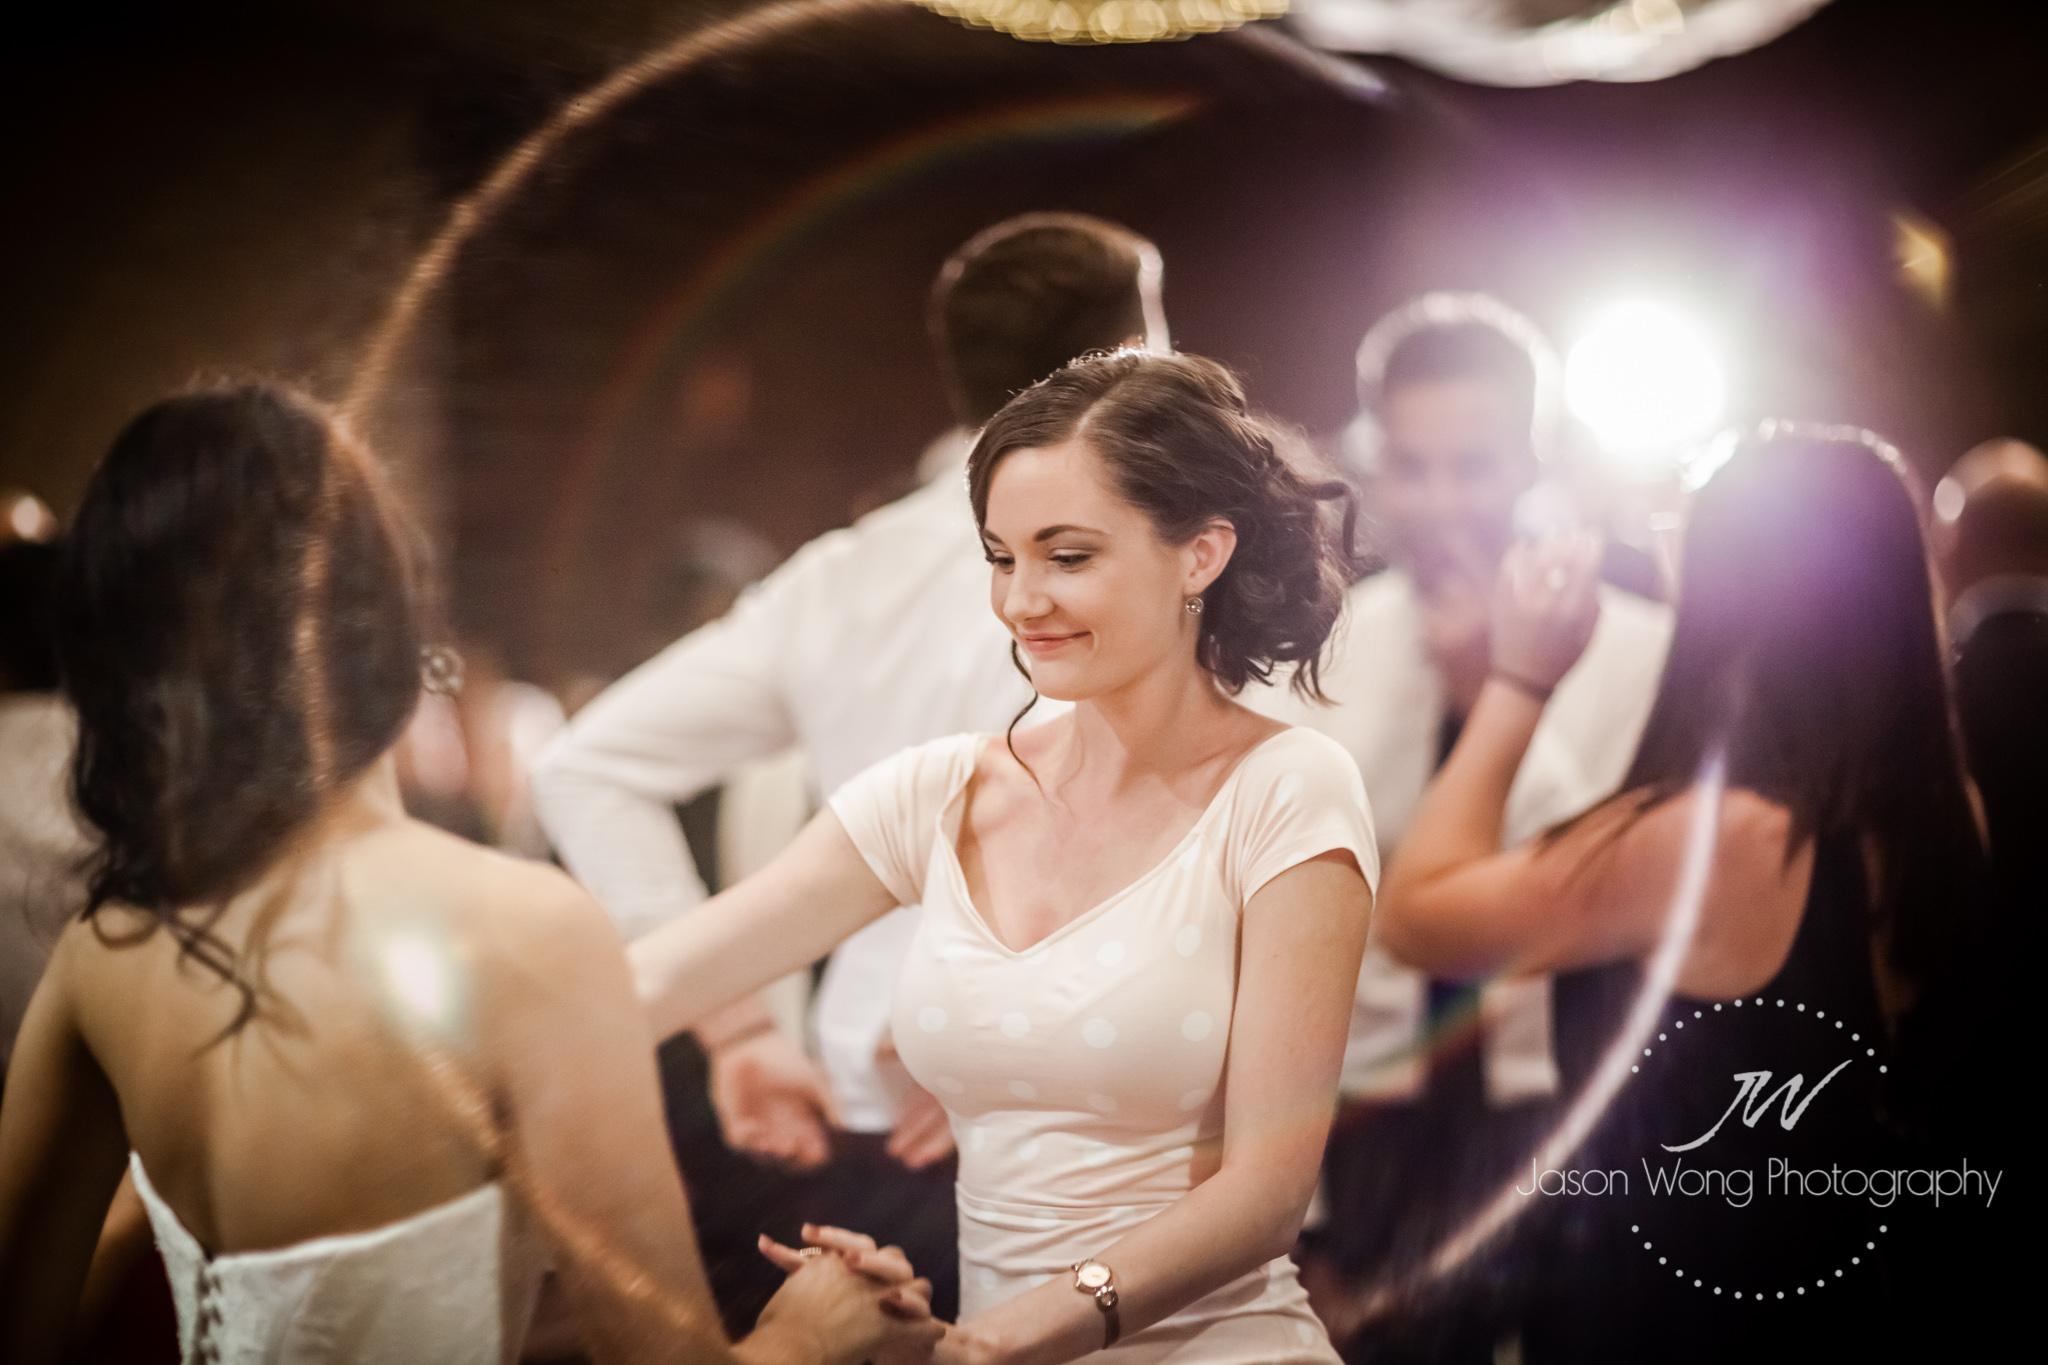 reception-guests-having-fun-dancing.jpg